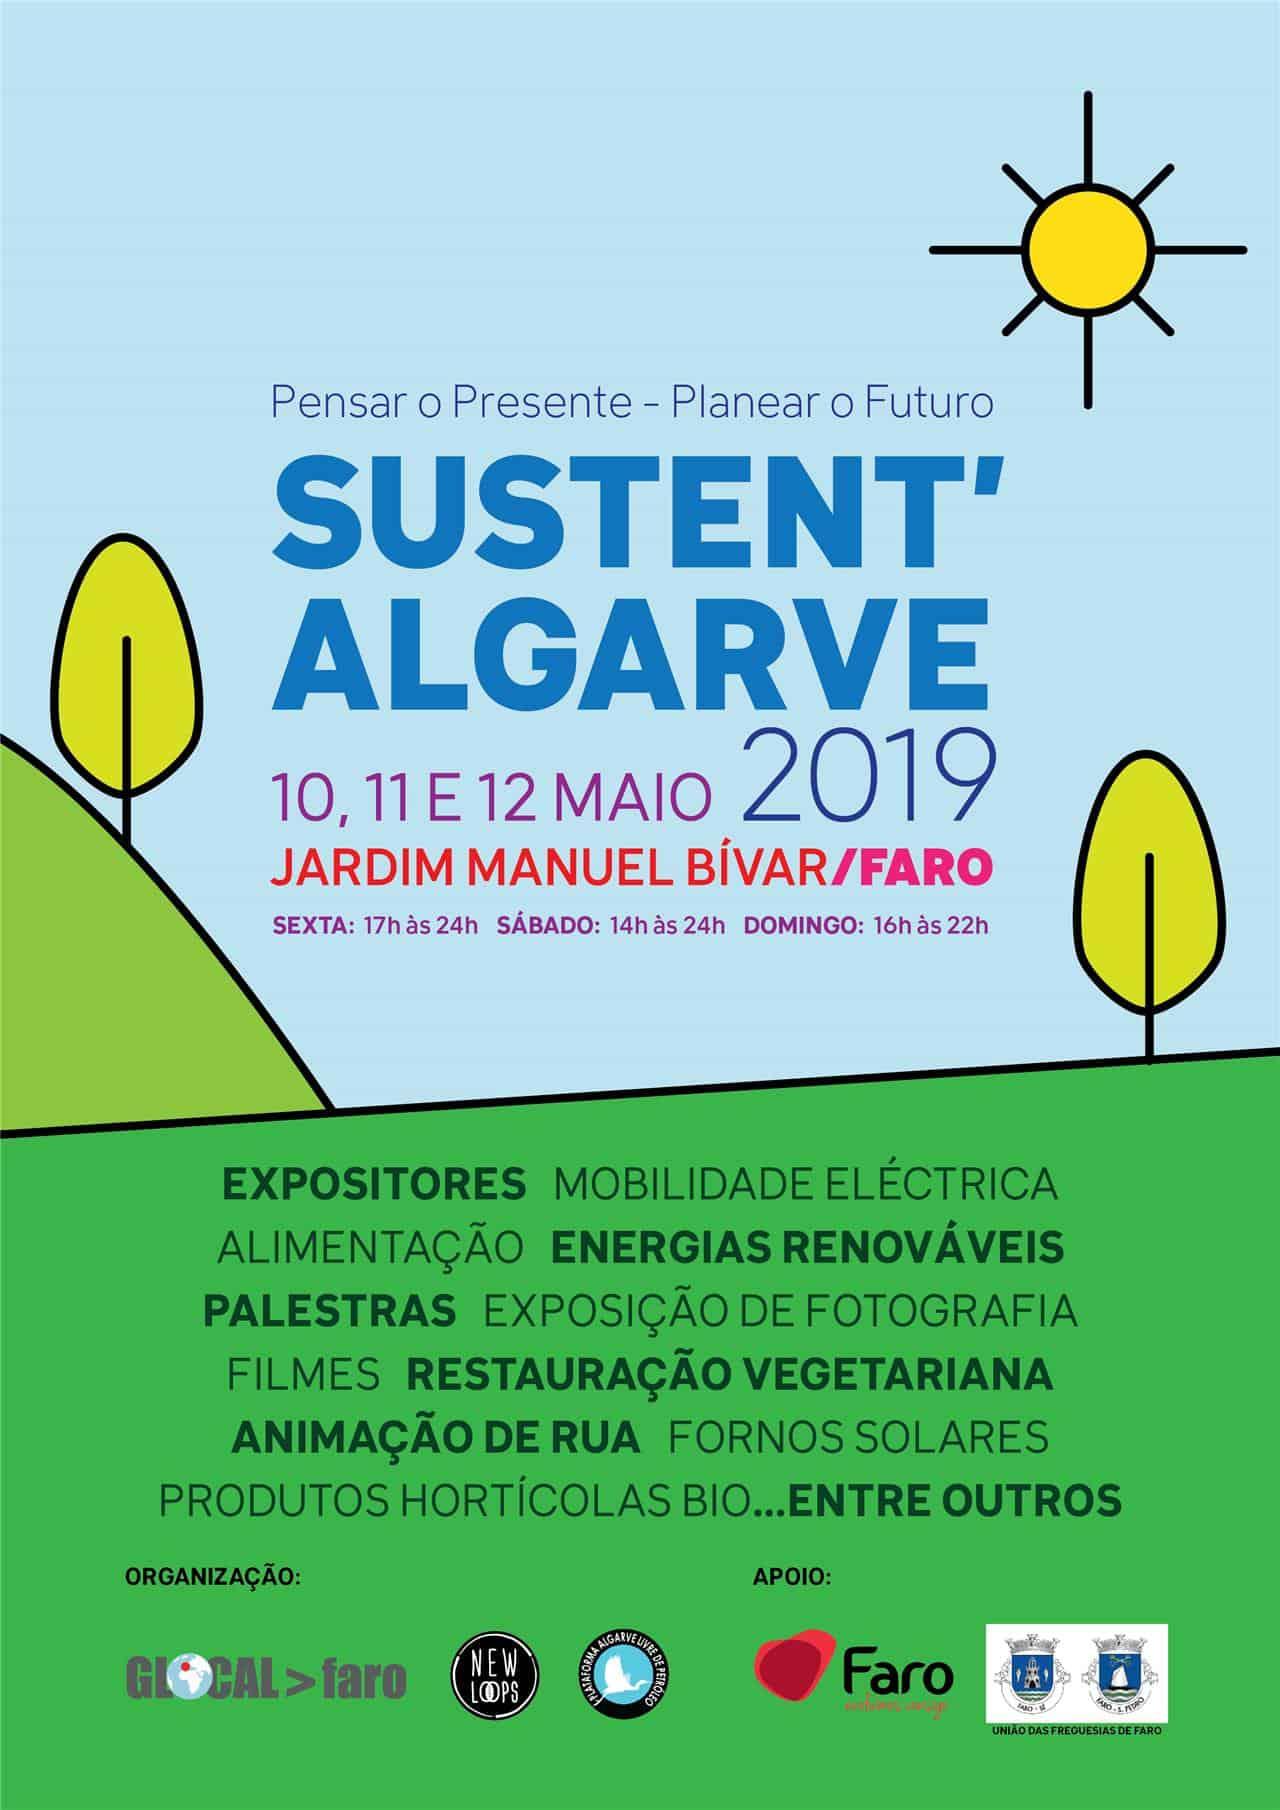 SUSTENT'ALGARVE 2019 FARO